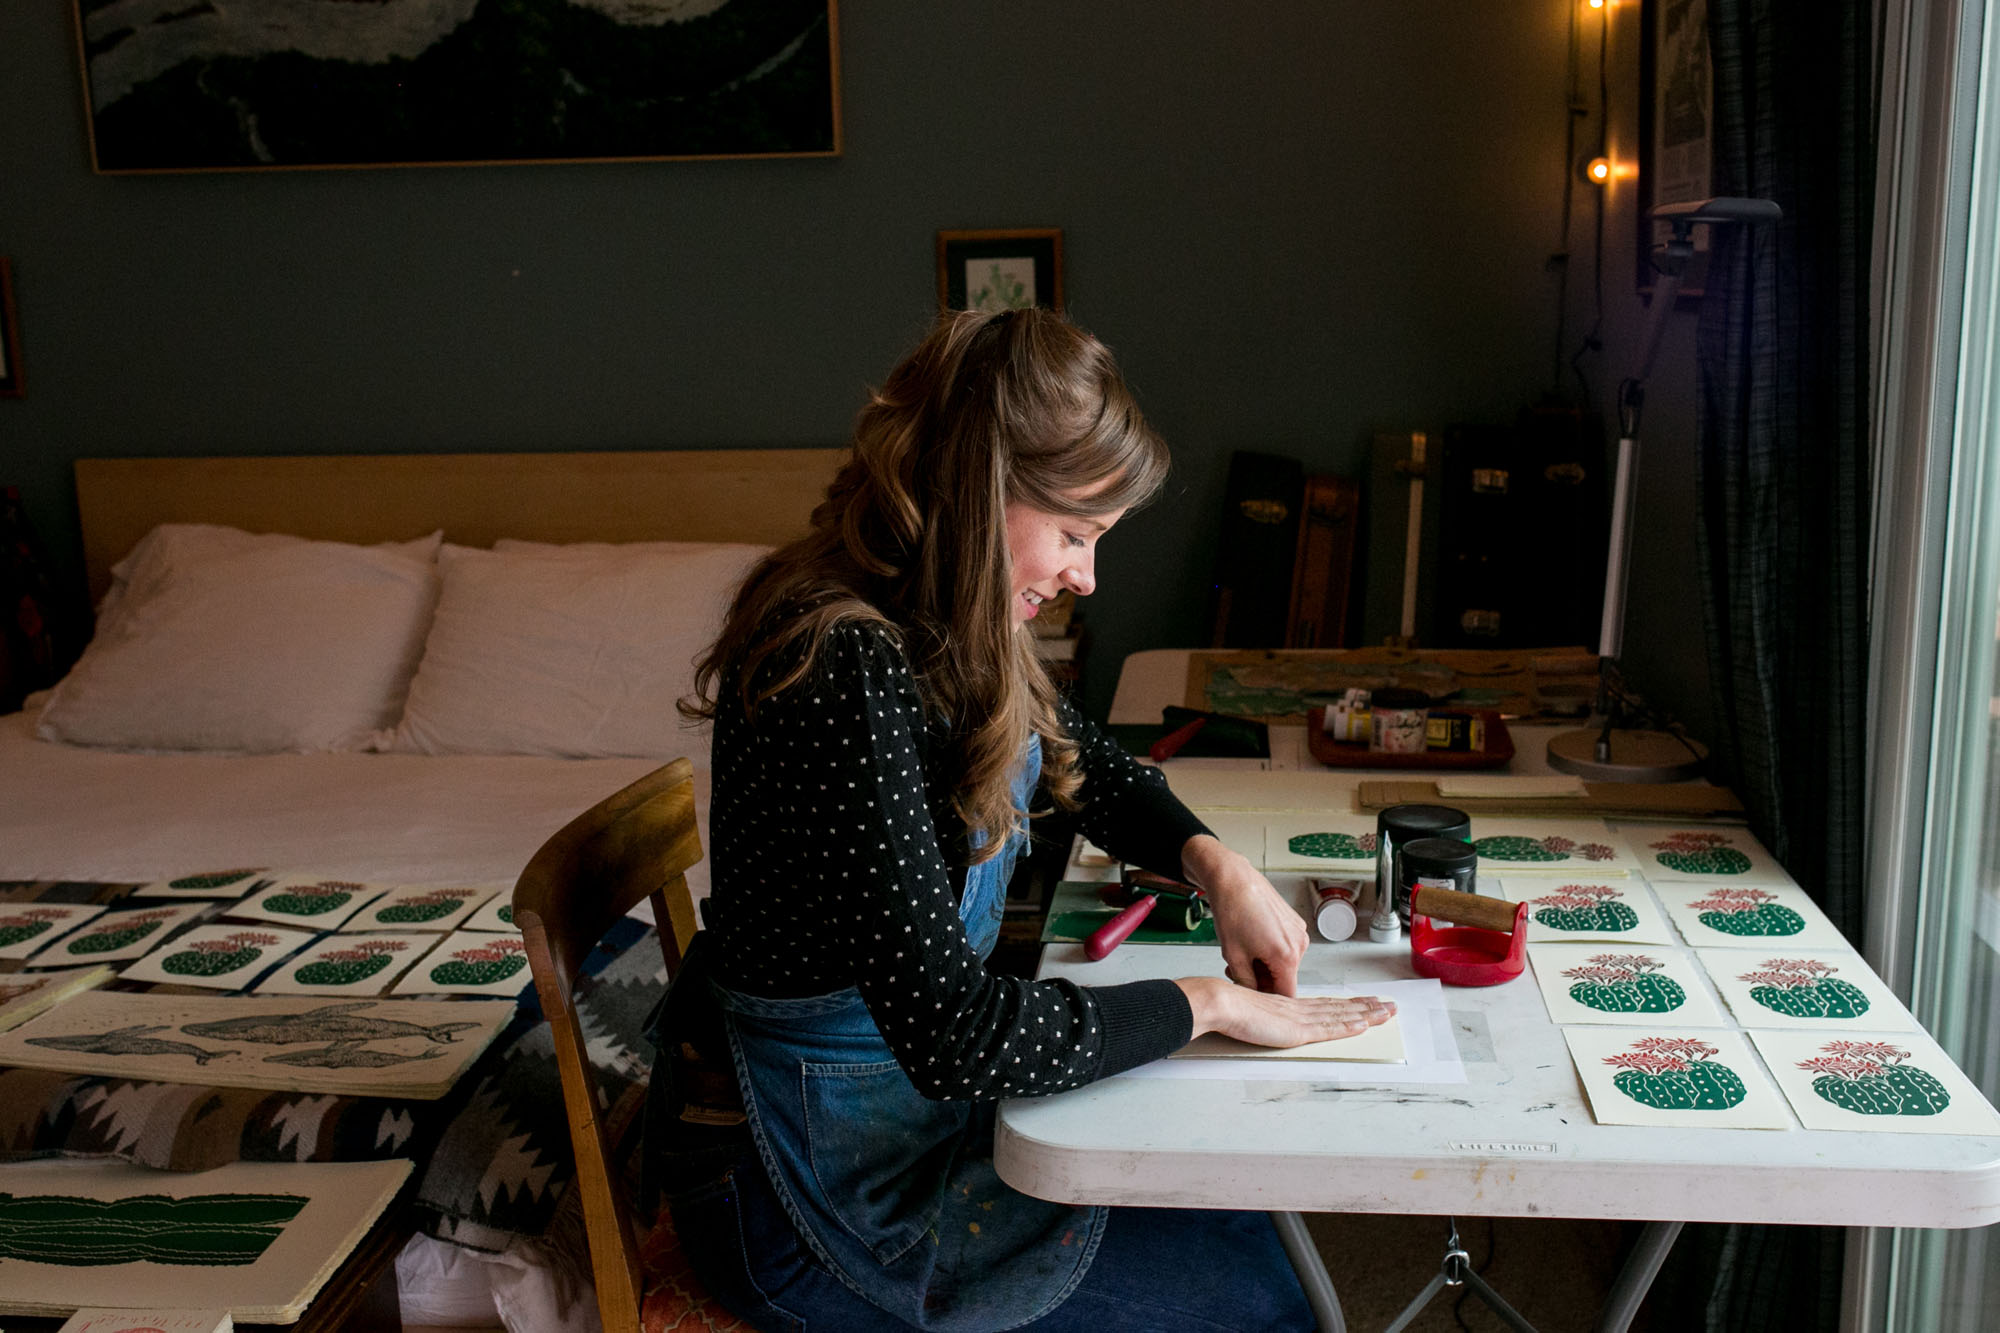 Lili_arnold-block-print-artist-home-studio-santa-cruz-branding-photography04.jpg